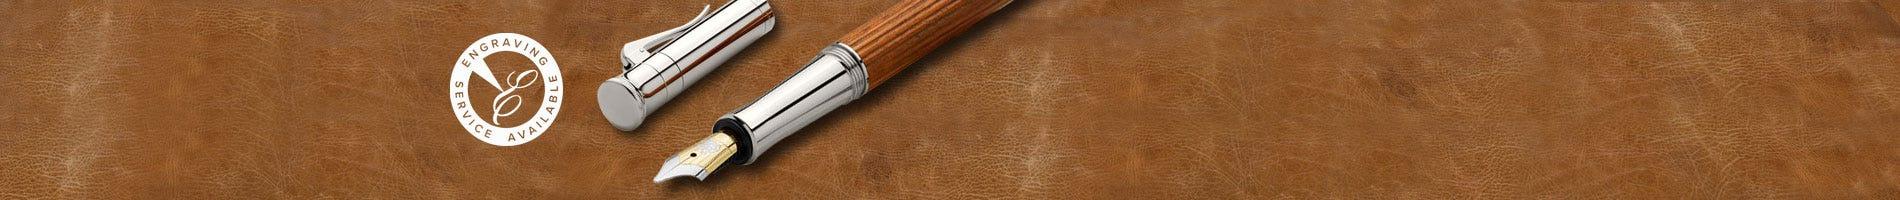 Graf von Faber-Castell guilloche cisele light grey pens